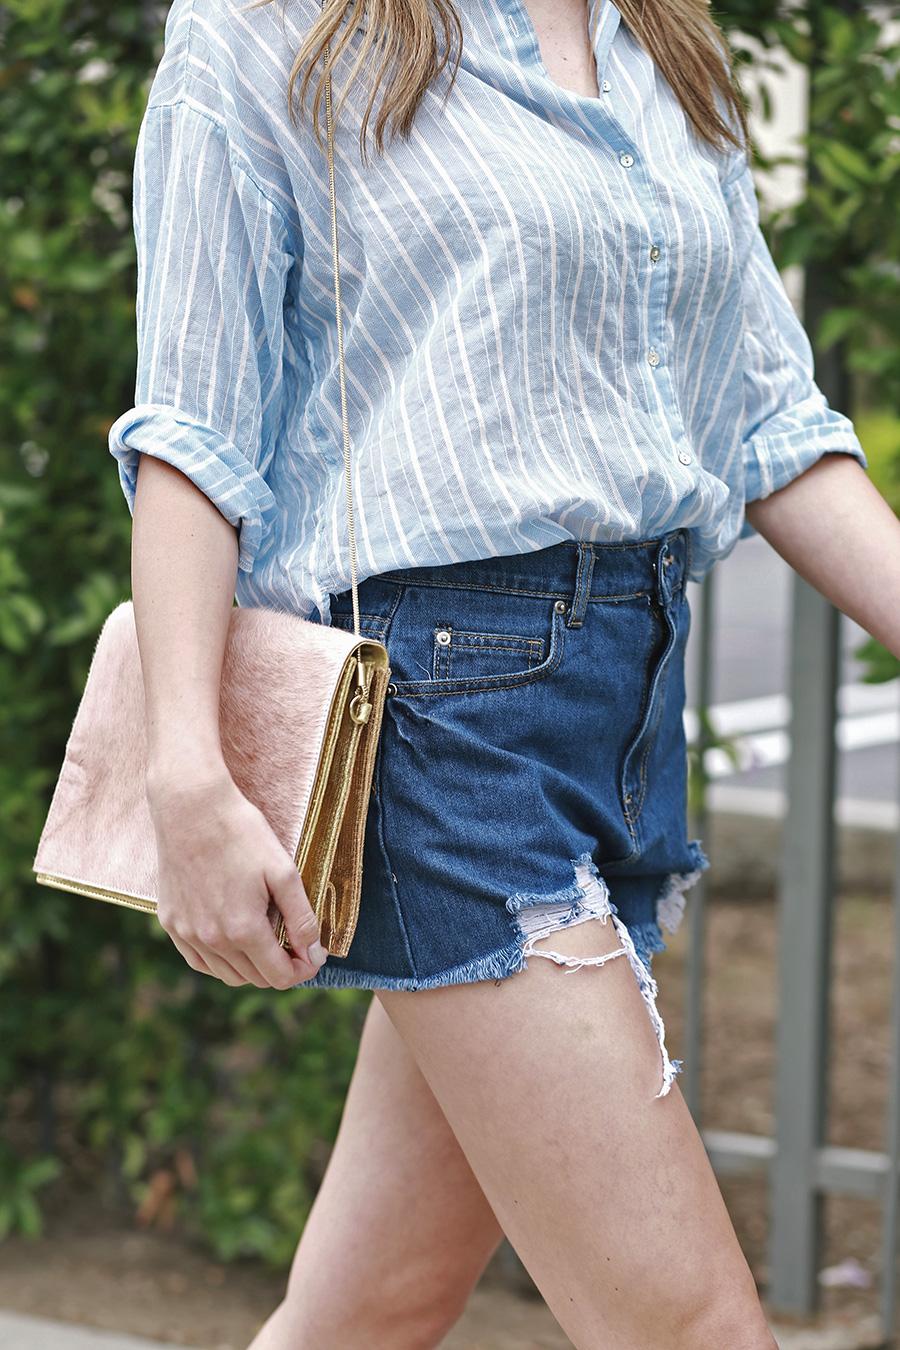 hm top forever21 shorts pixie market sandals ganni handbag 5